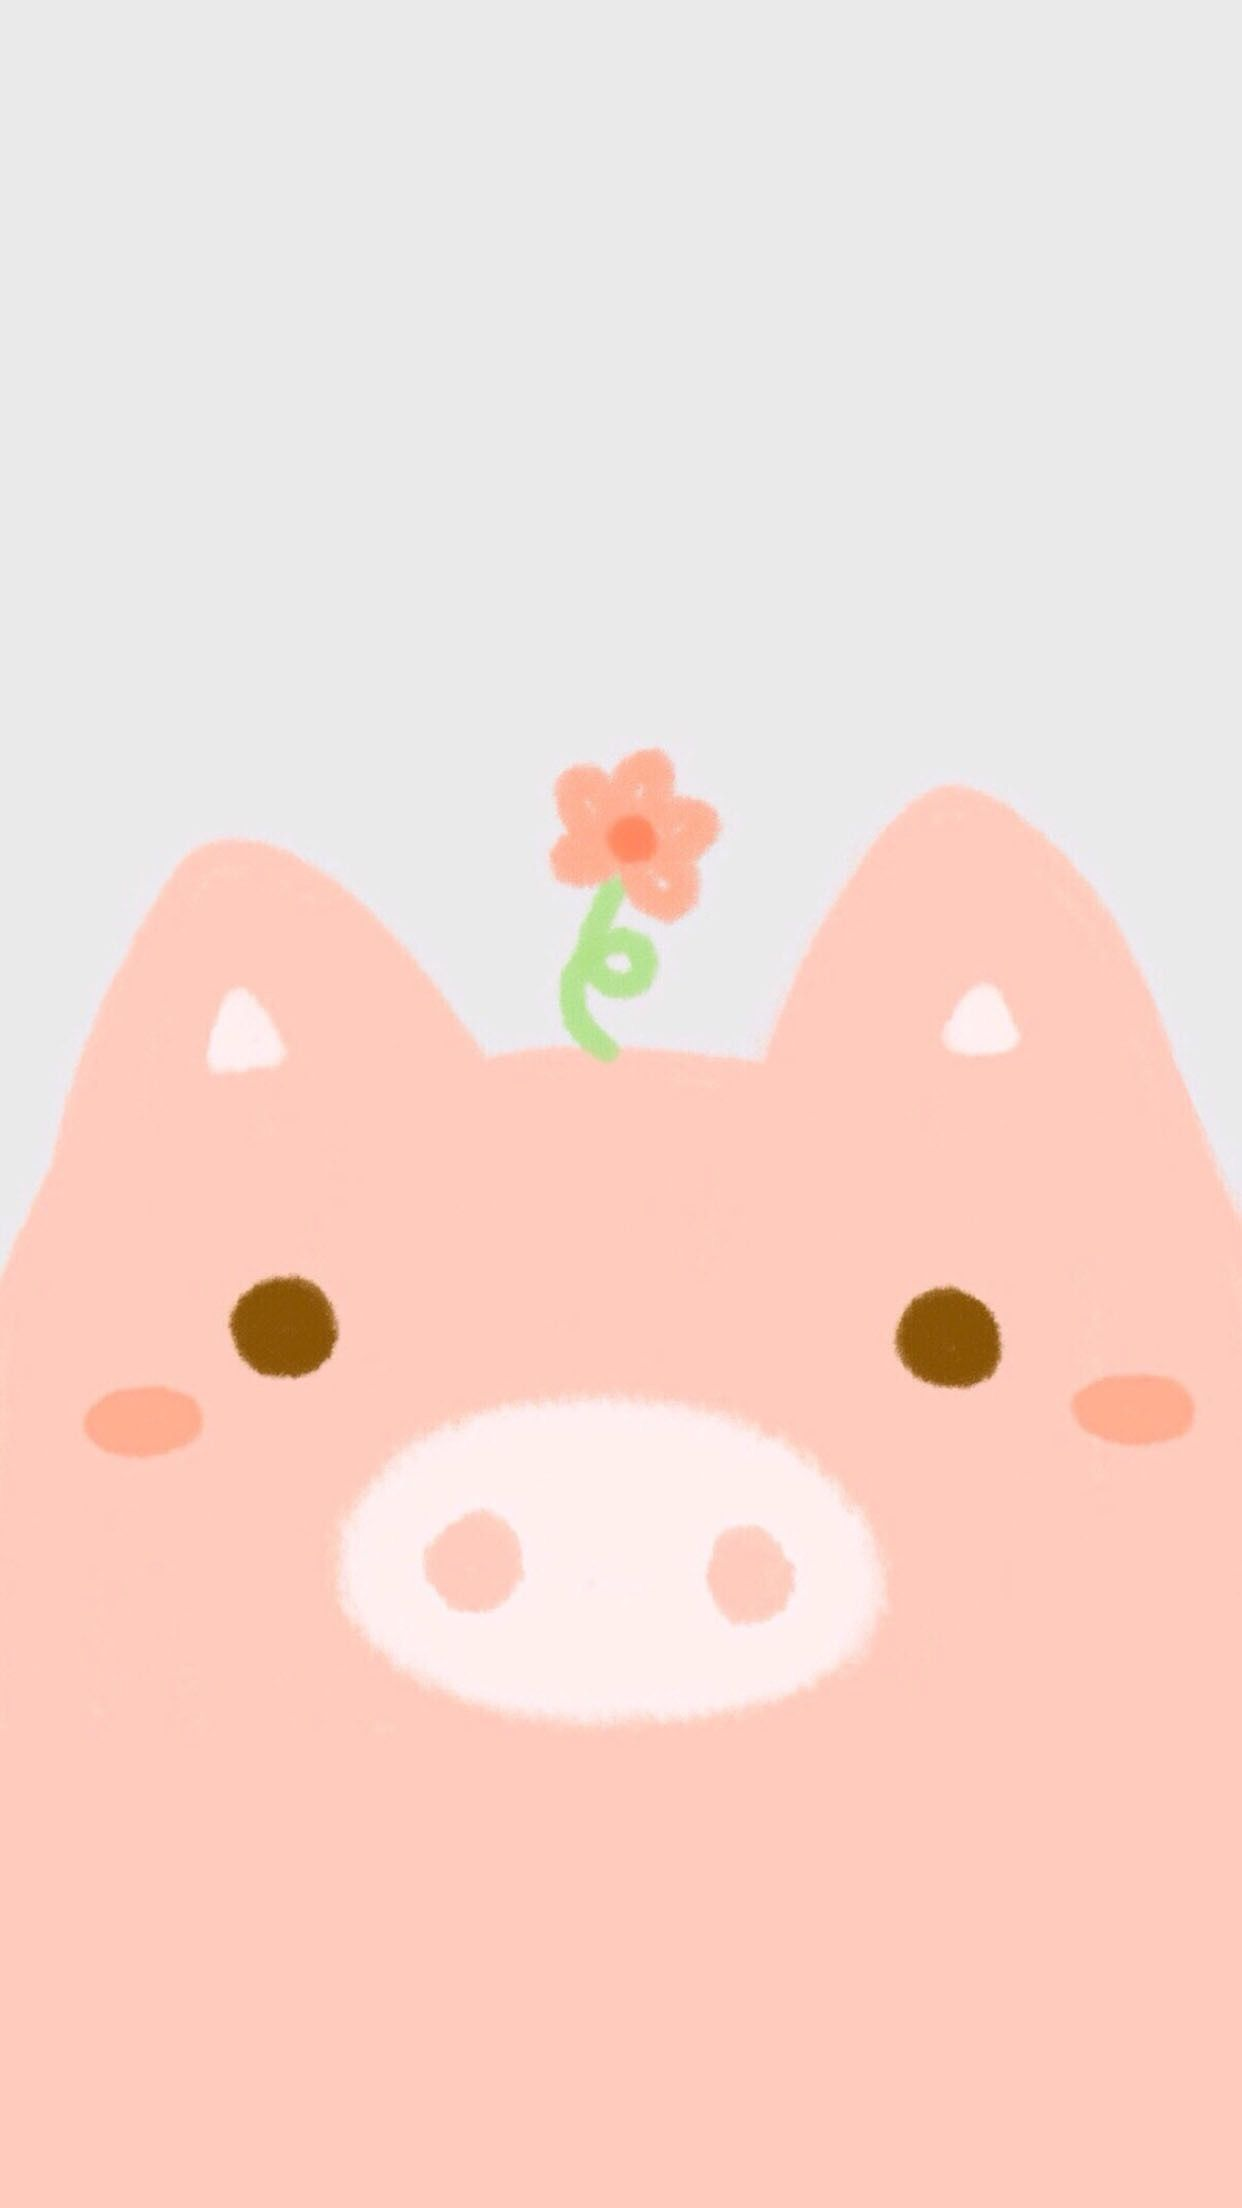 Cool kawaii cute pig wallpaper hd images